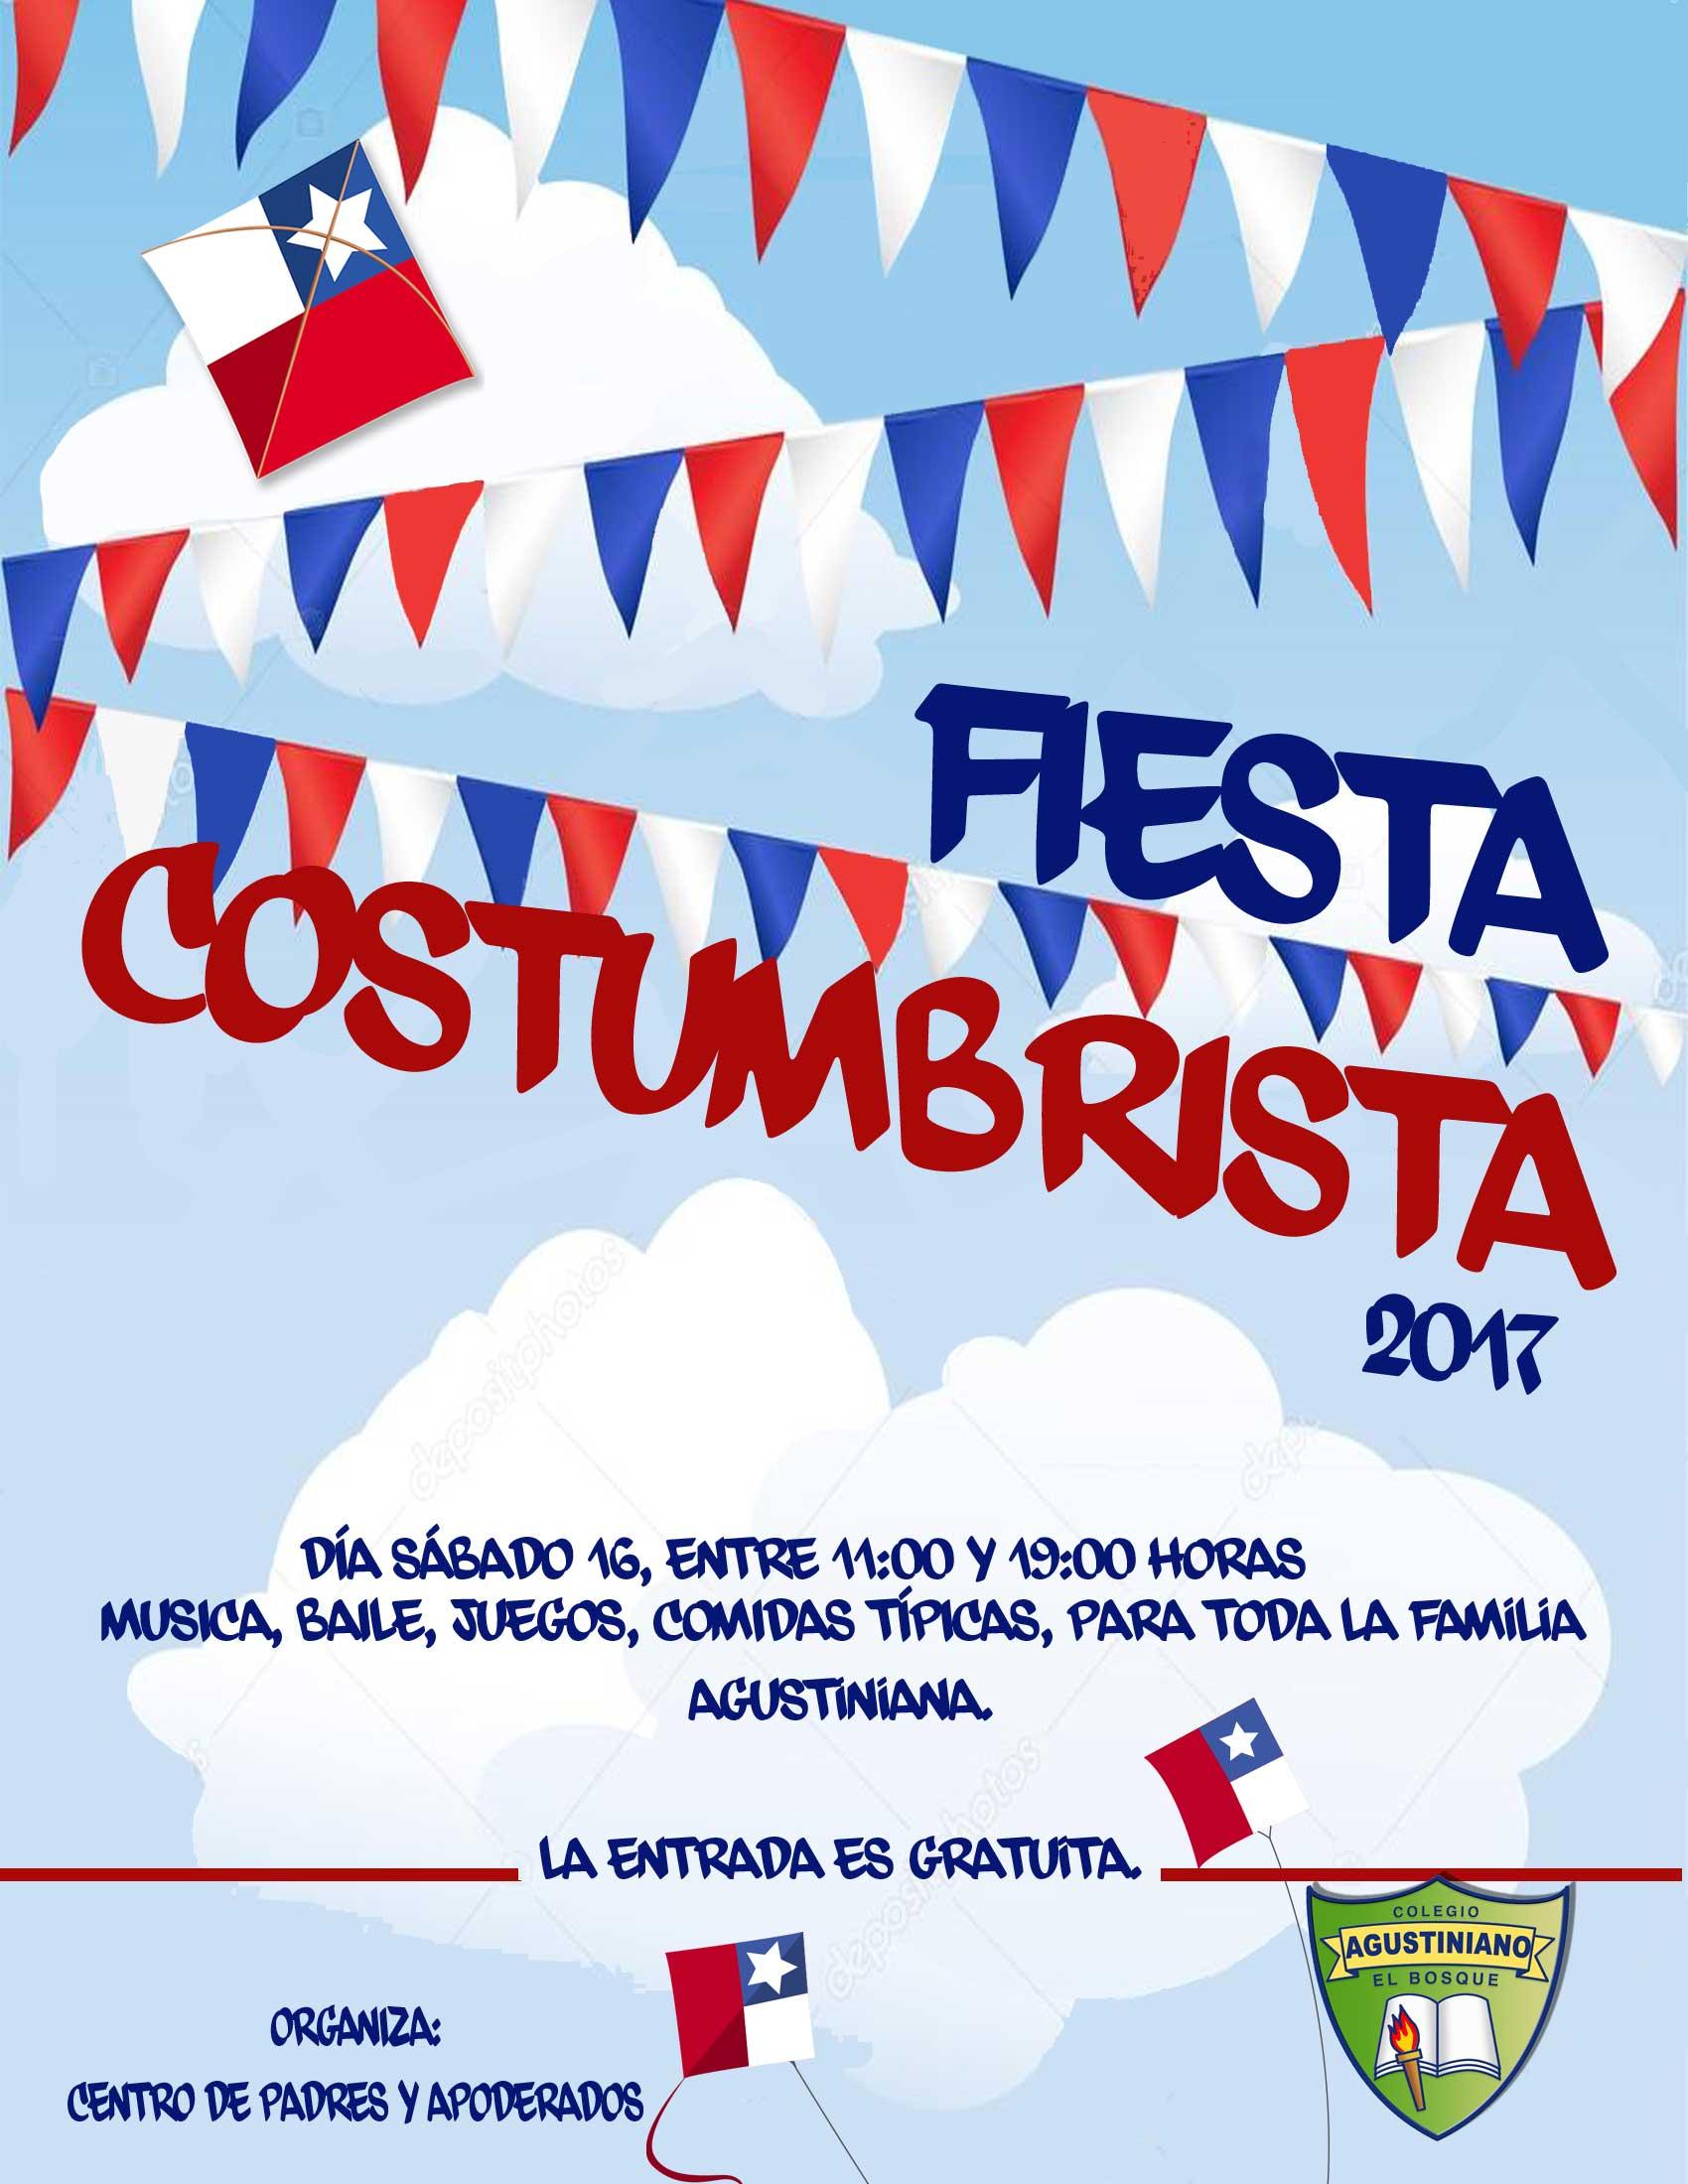 FIESTA COSTUMBRISTA 2017